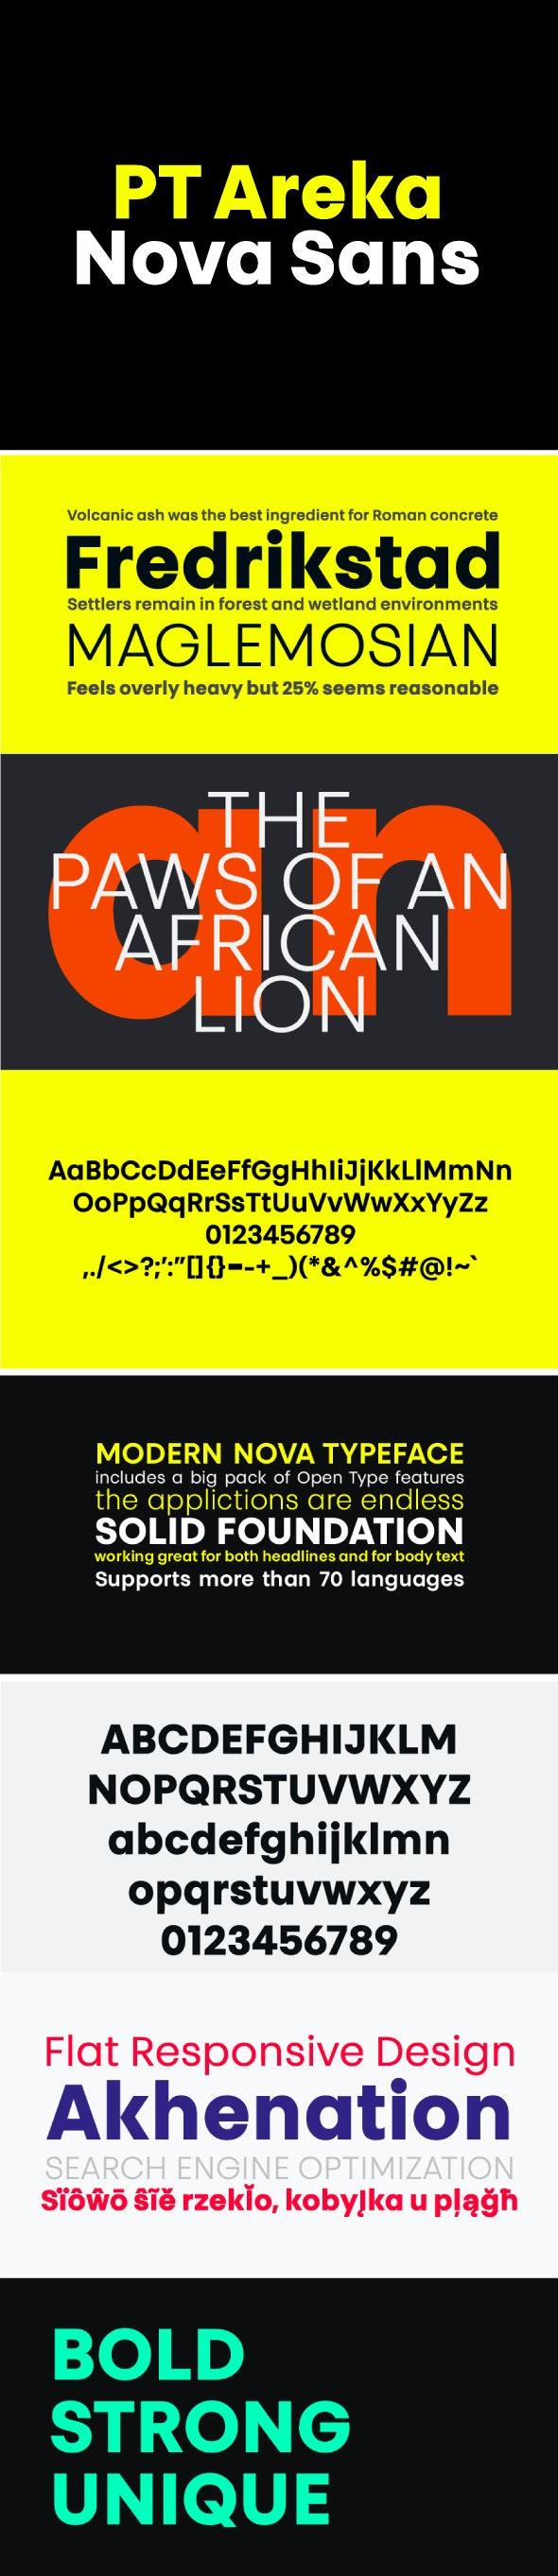 PT Areka Nova Font - Miscellaneous Sans-Serif